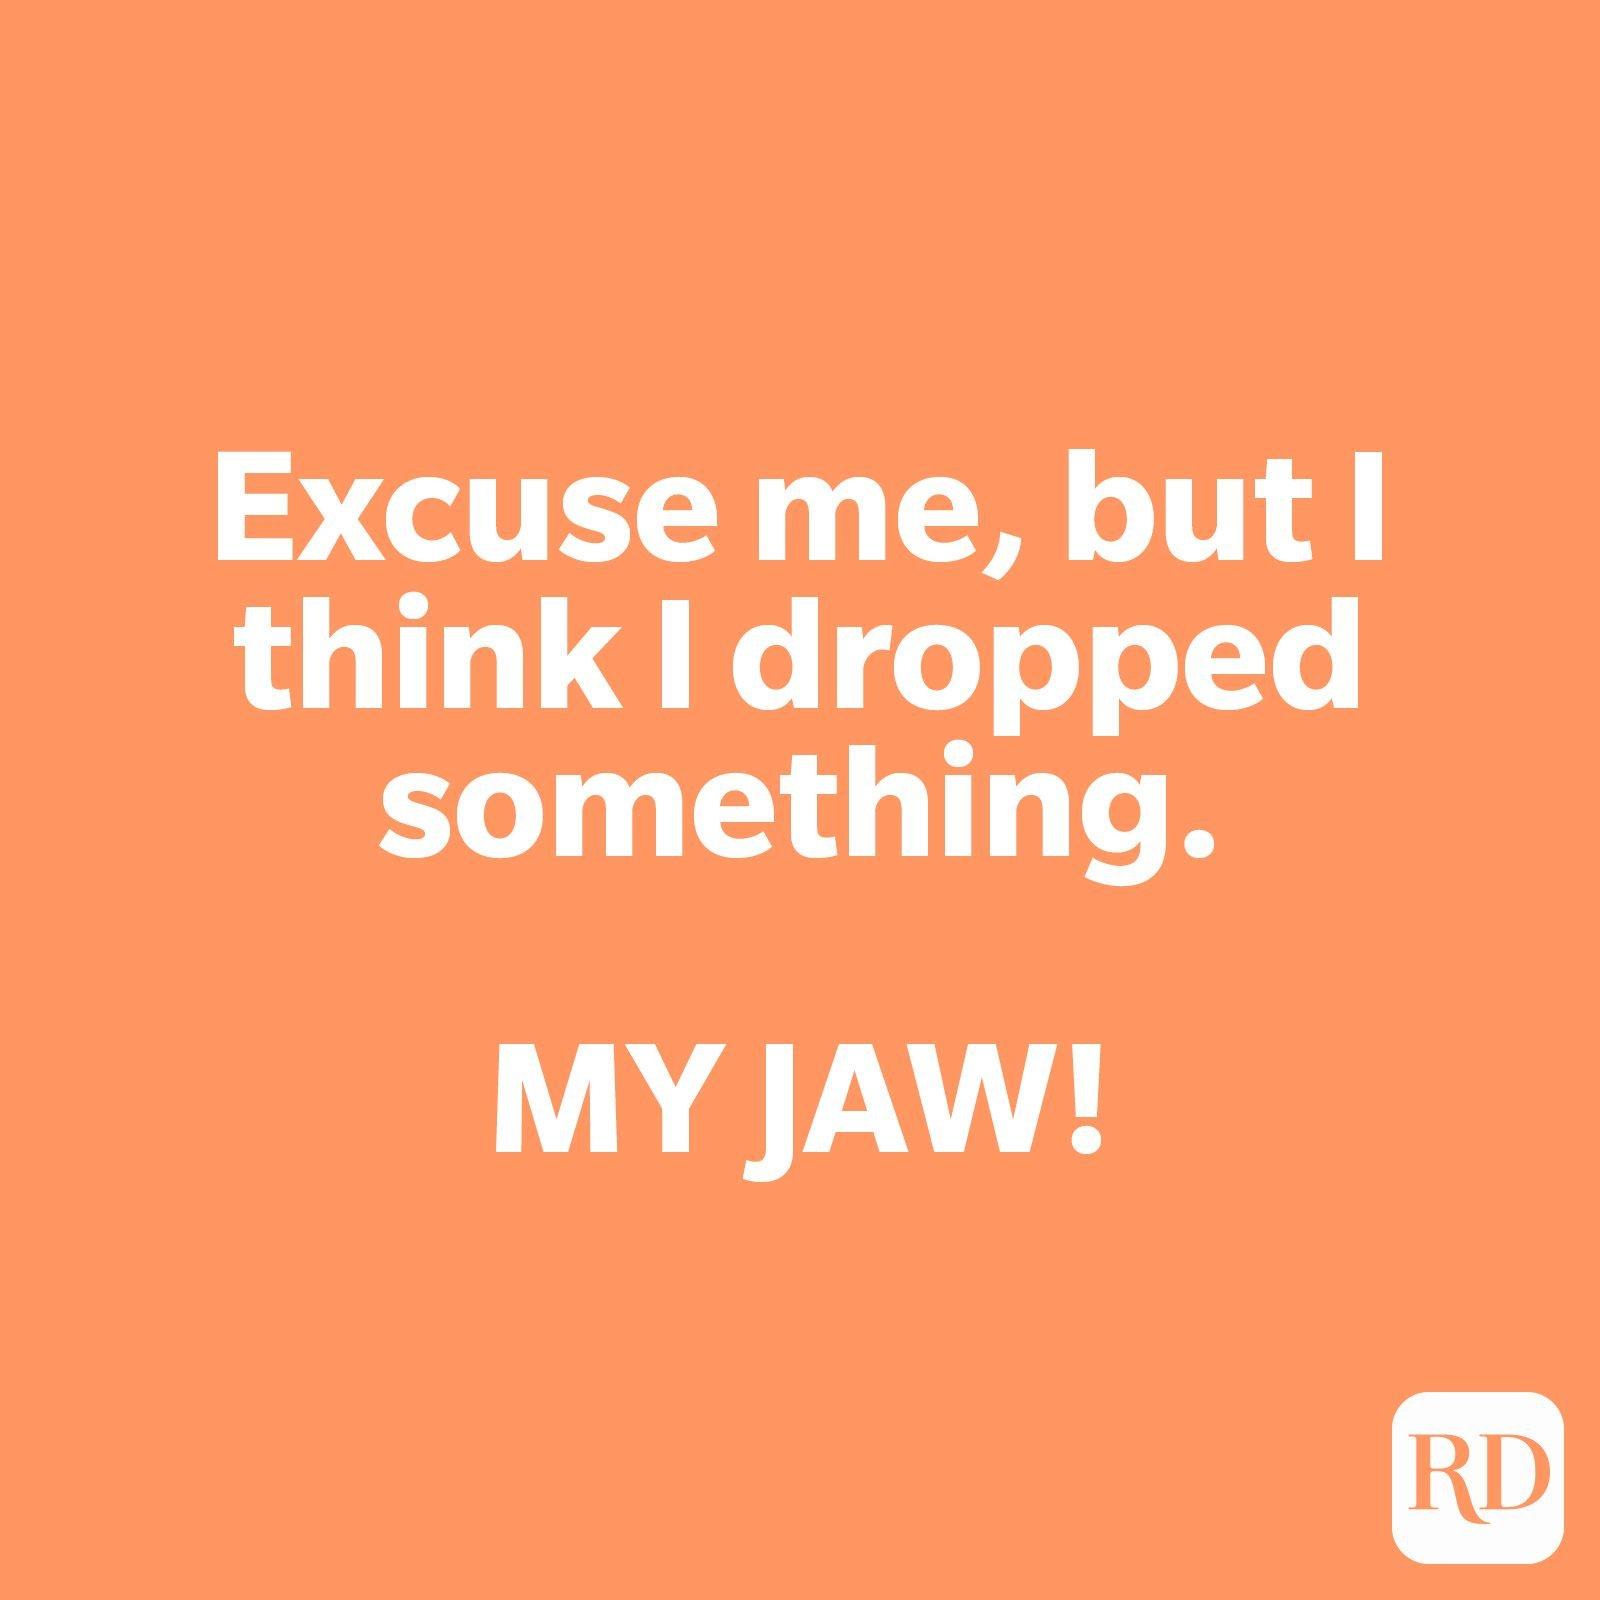 Excuse me, but I think I dropped something. MY JAW!